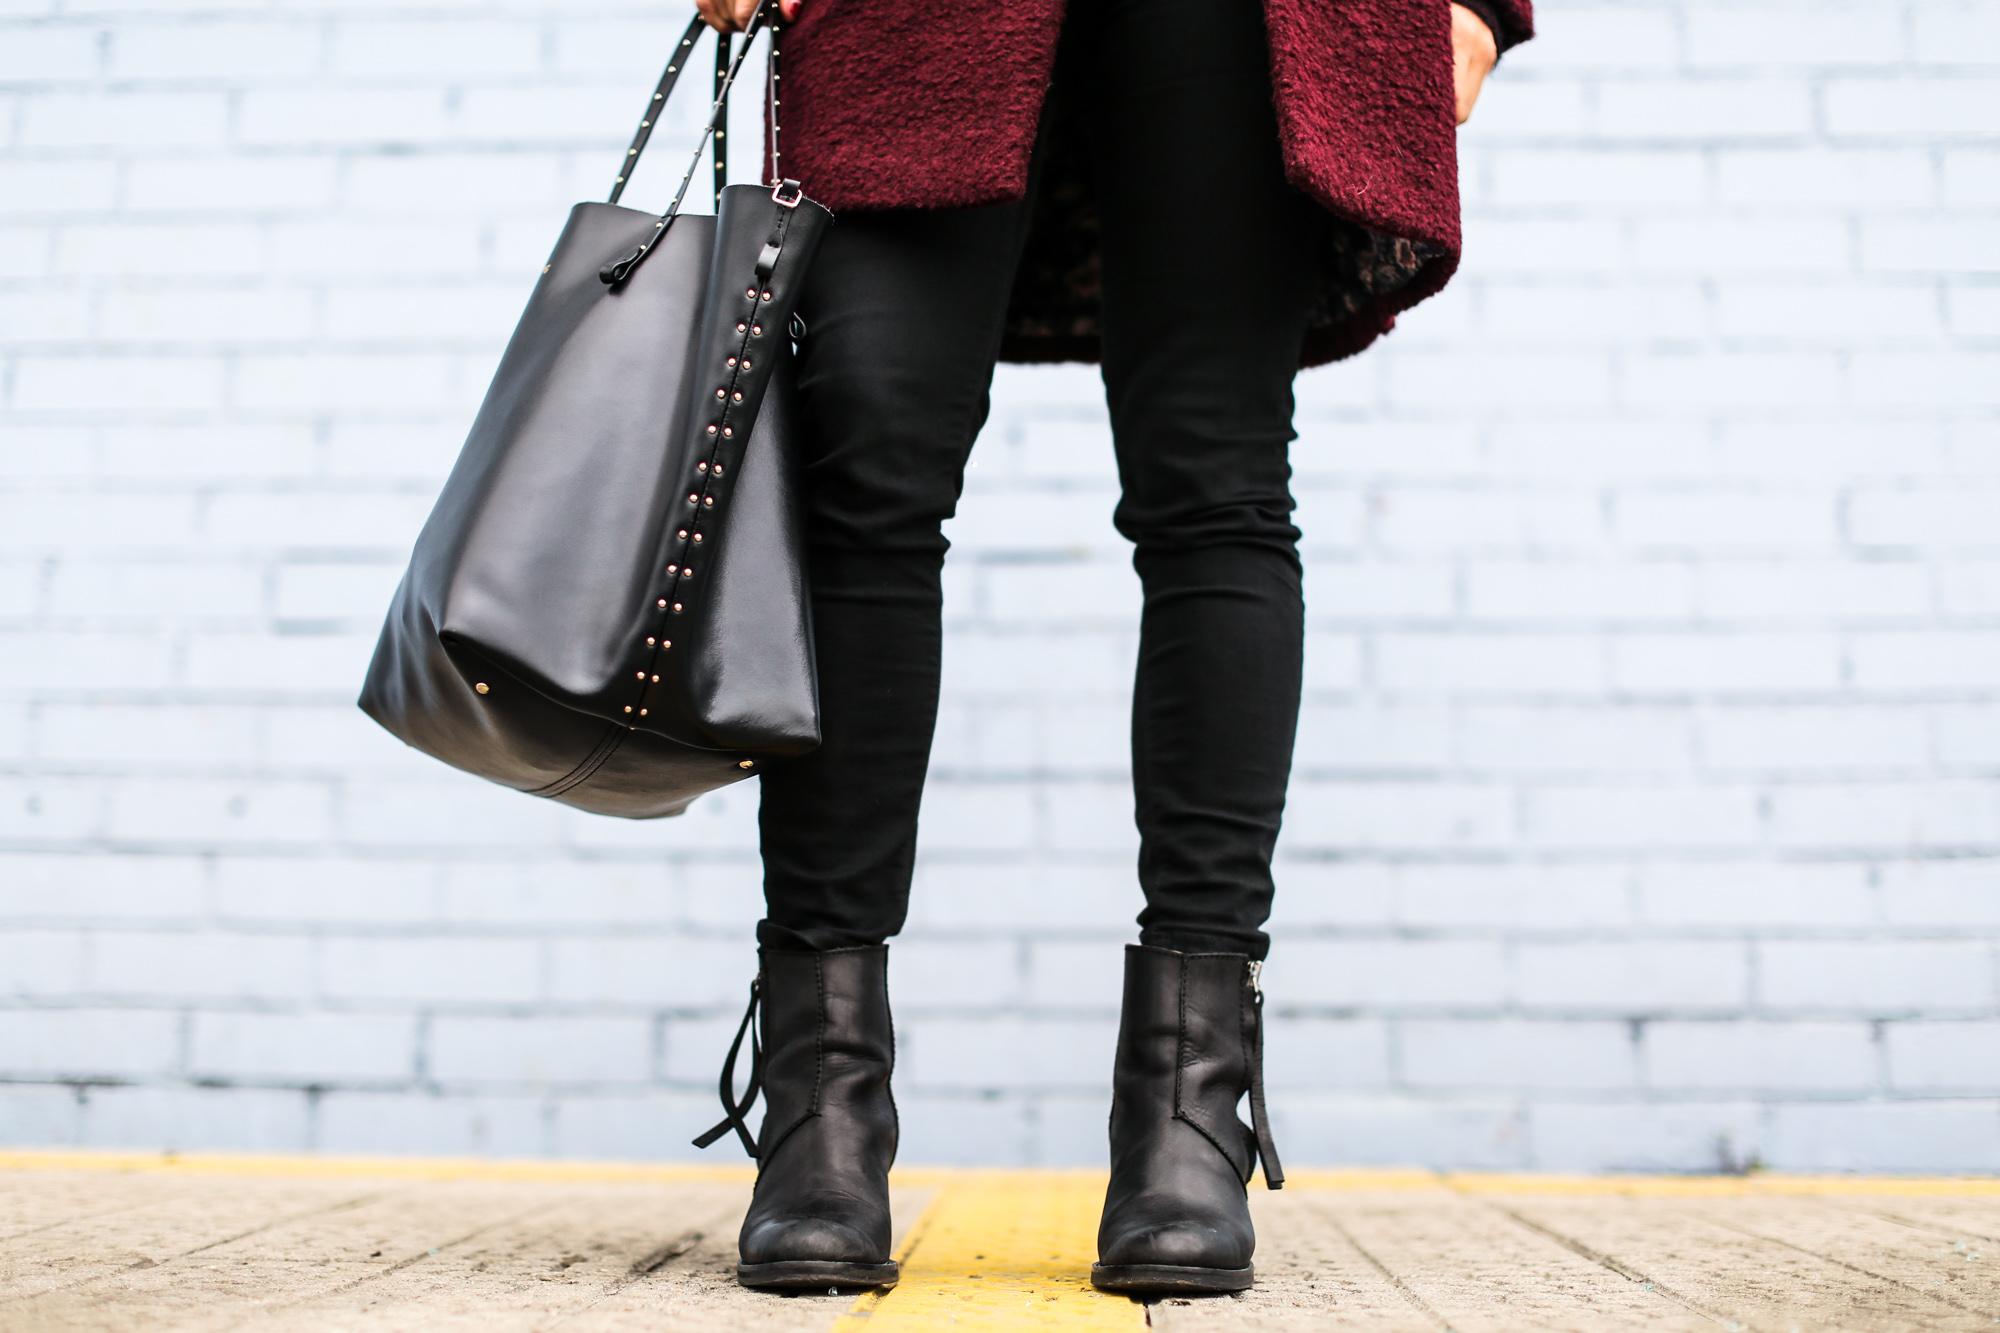 Clochet_streetstyle_burgundy_wool_coat_acne_studios_pistol_boots-9